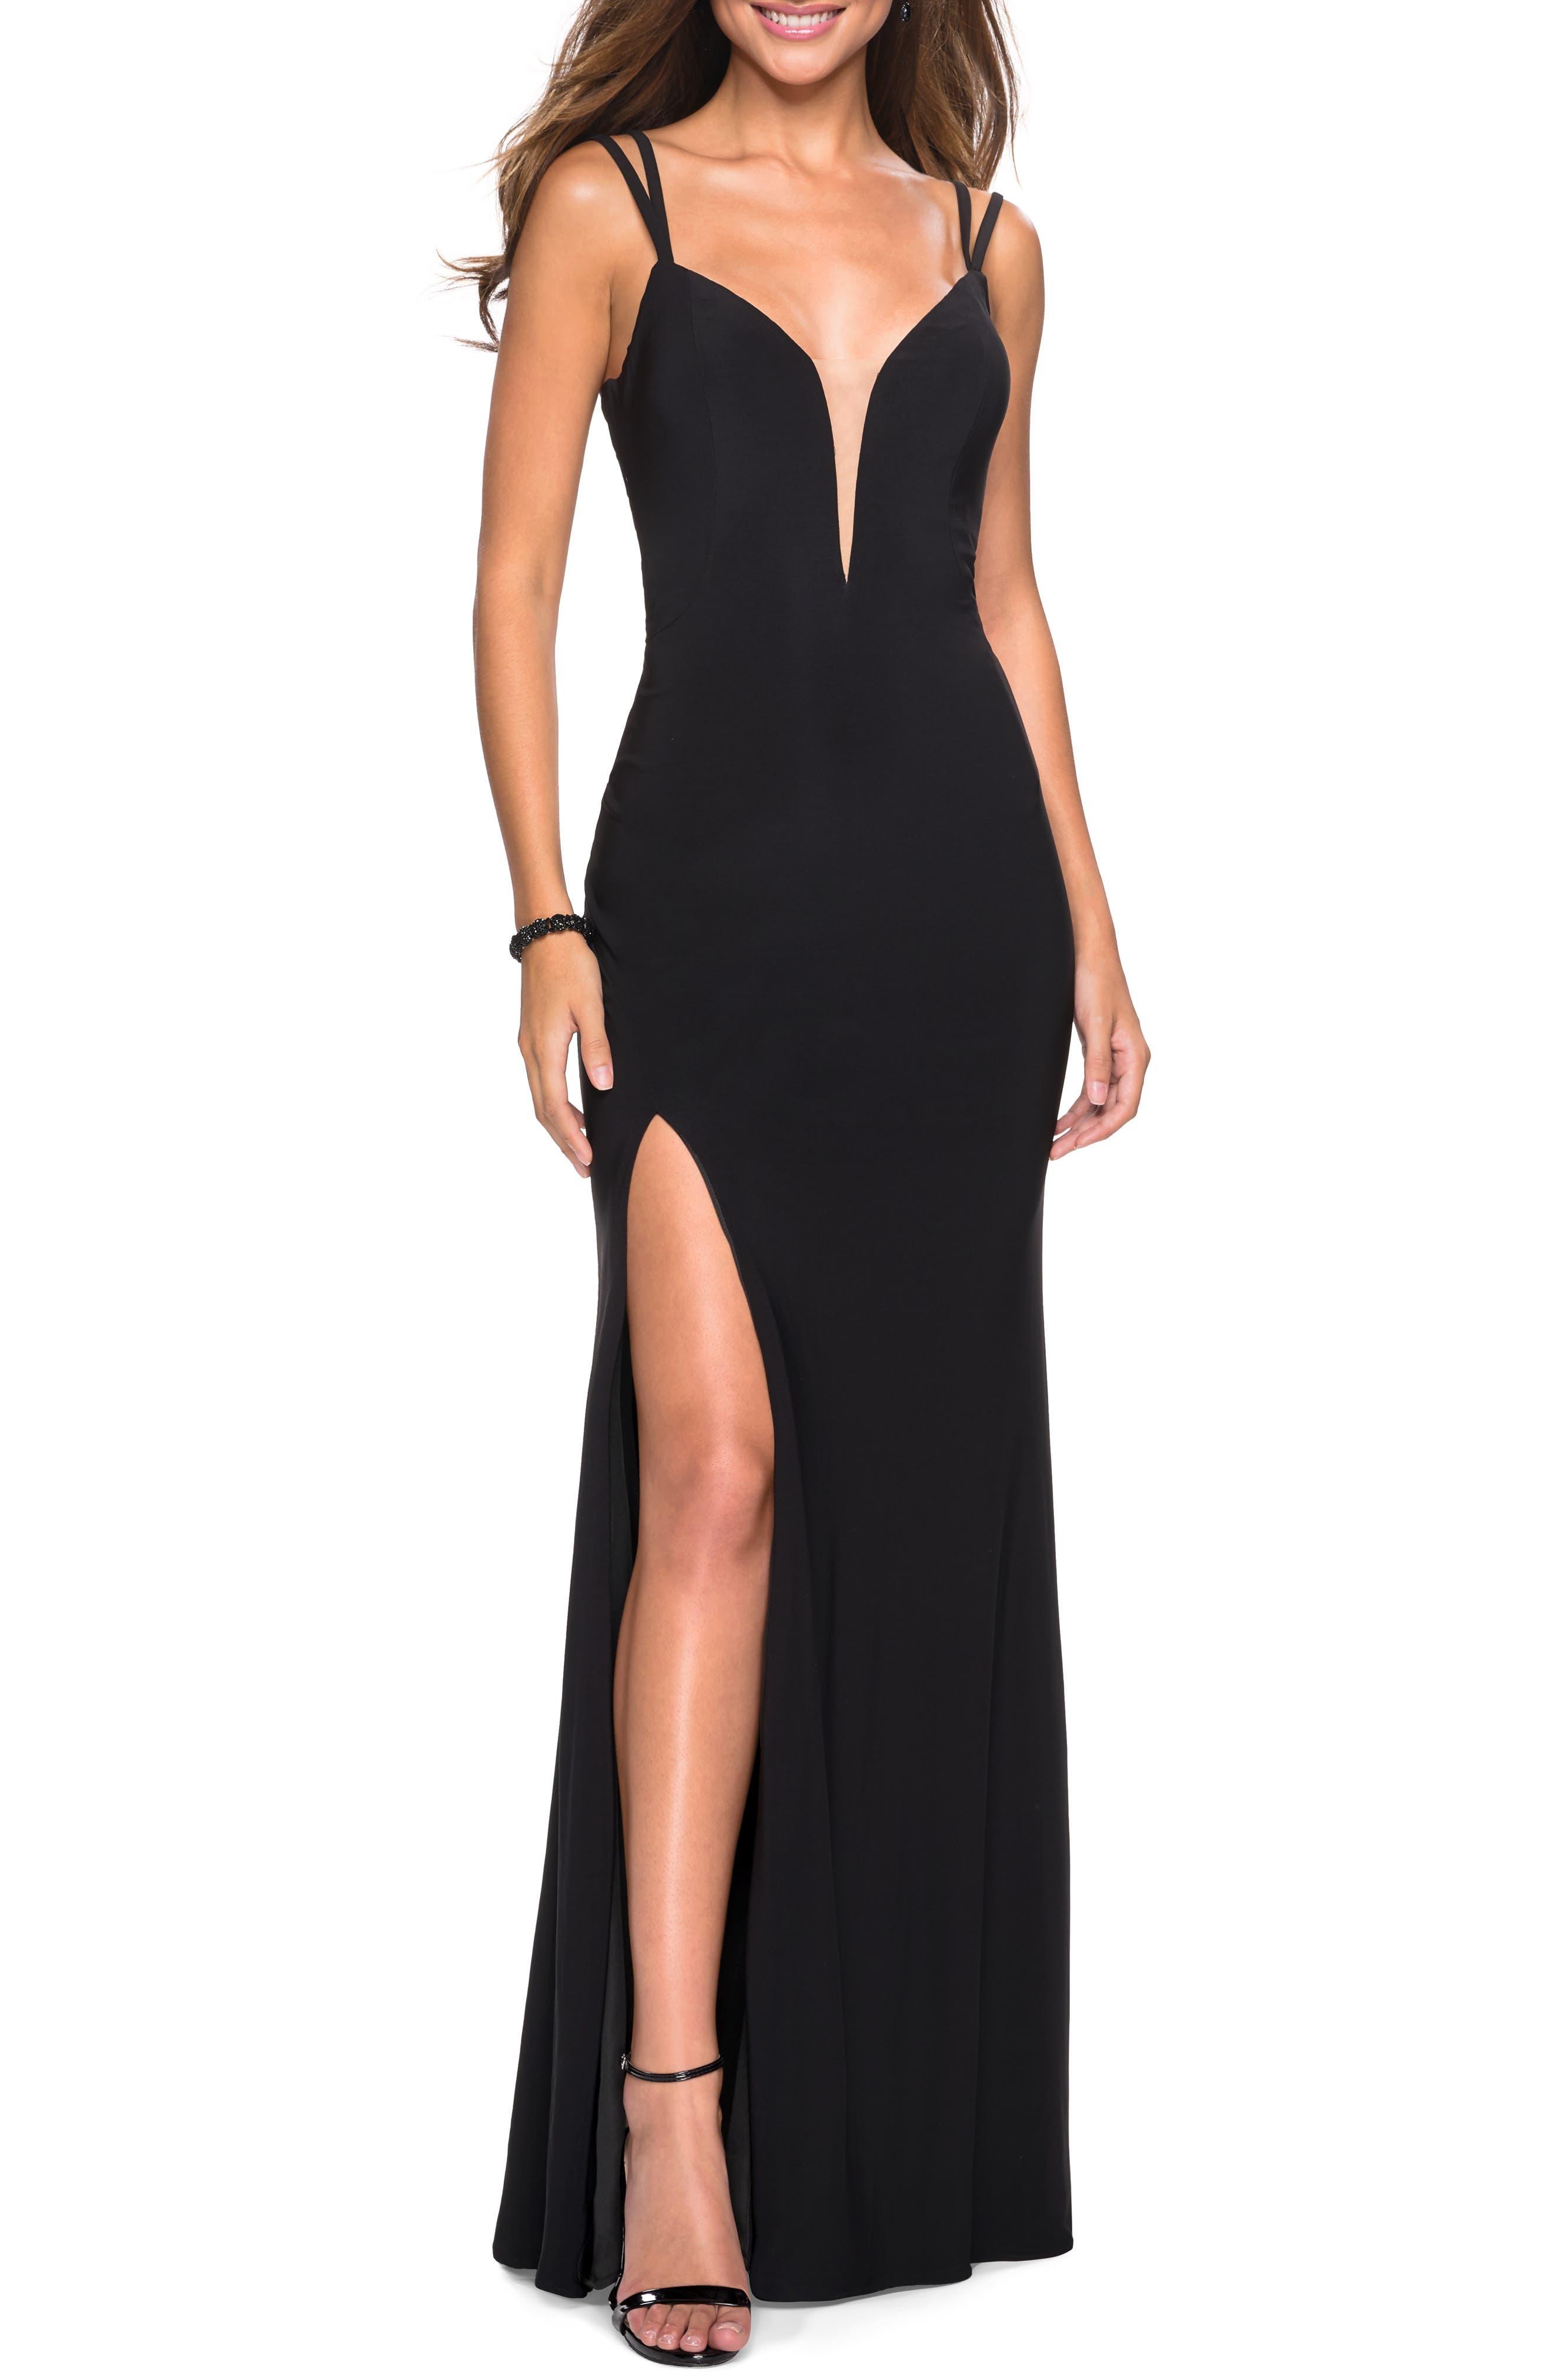 La Femme Strappy Back Fitted Jersey Evening Dress, Black